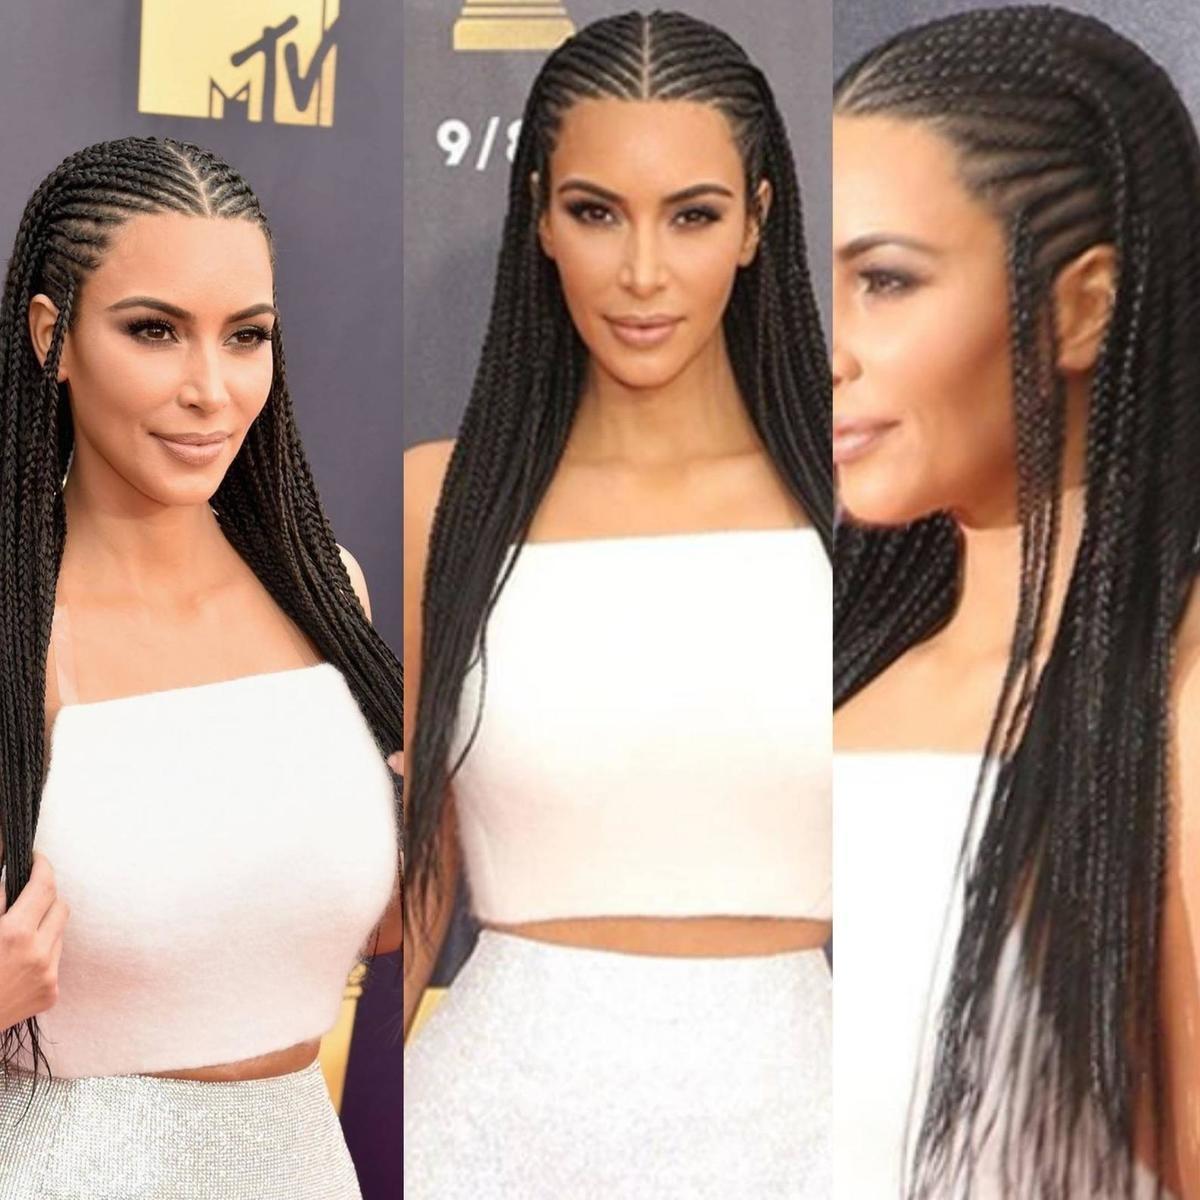 Kim Inspired Braided Wig Cornrow Wig Ghana Weaving Wig By House